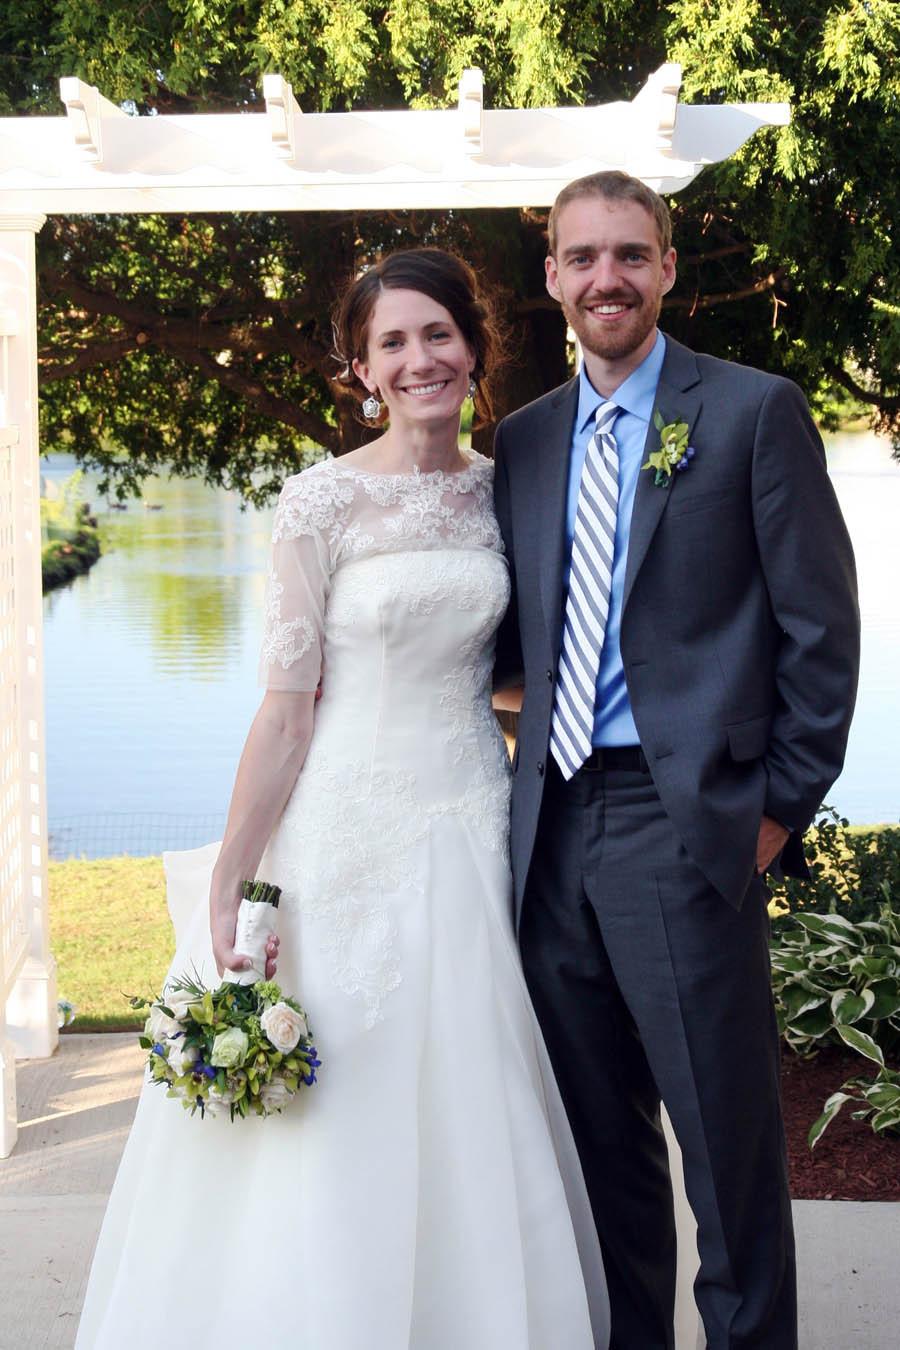 Bride%20and%20groom%20under%20arbor.full